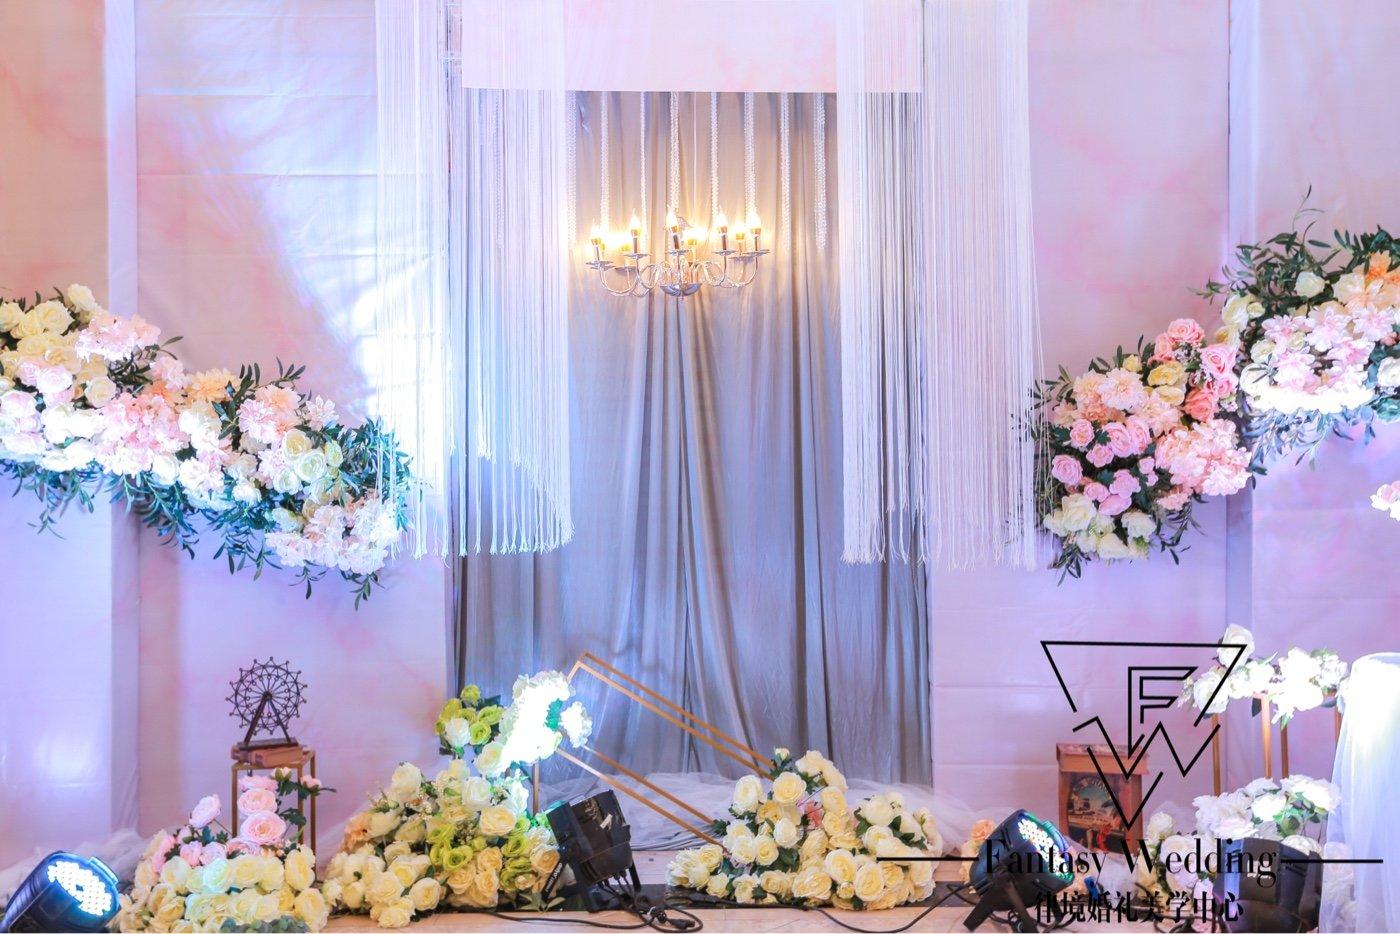 「Fantasy Wedding」&琪瑞康郡「遇见」主题0